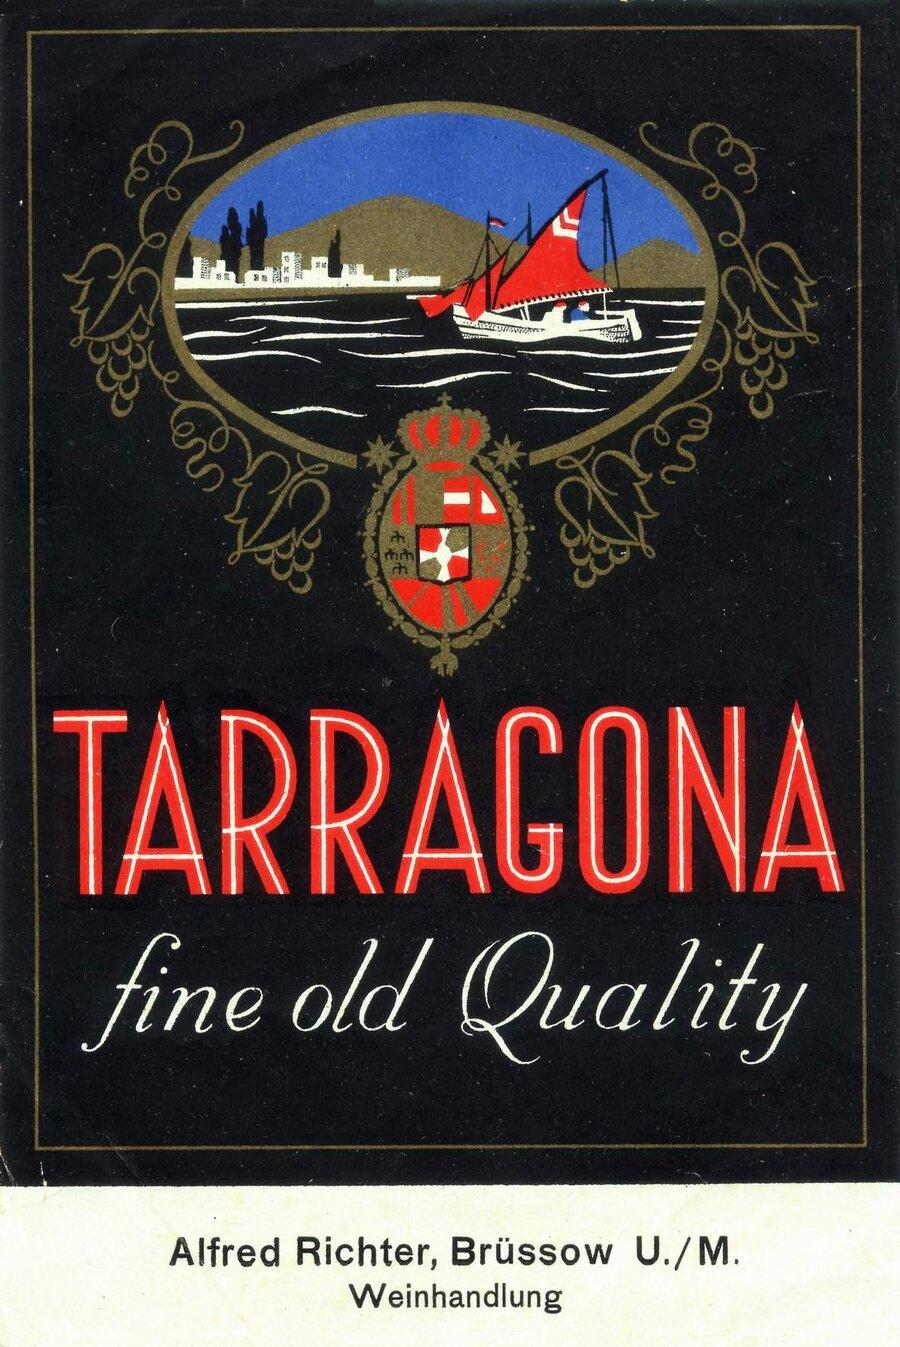 Etikett Tarragona fine old Quality, ©Stephan Becker, Brüssow